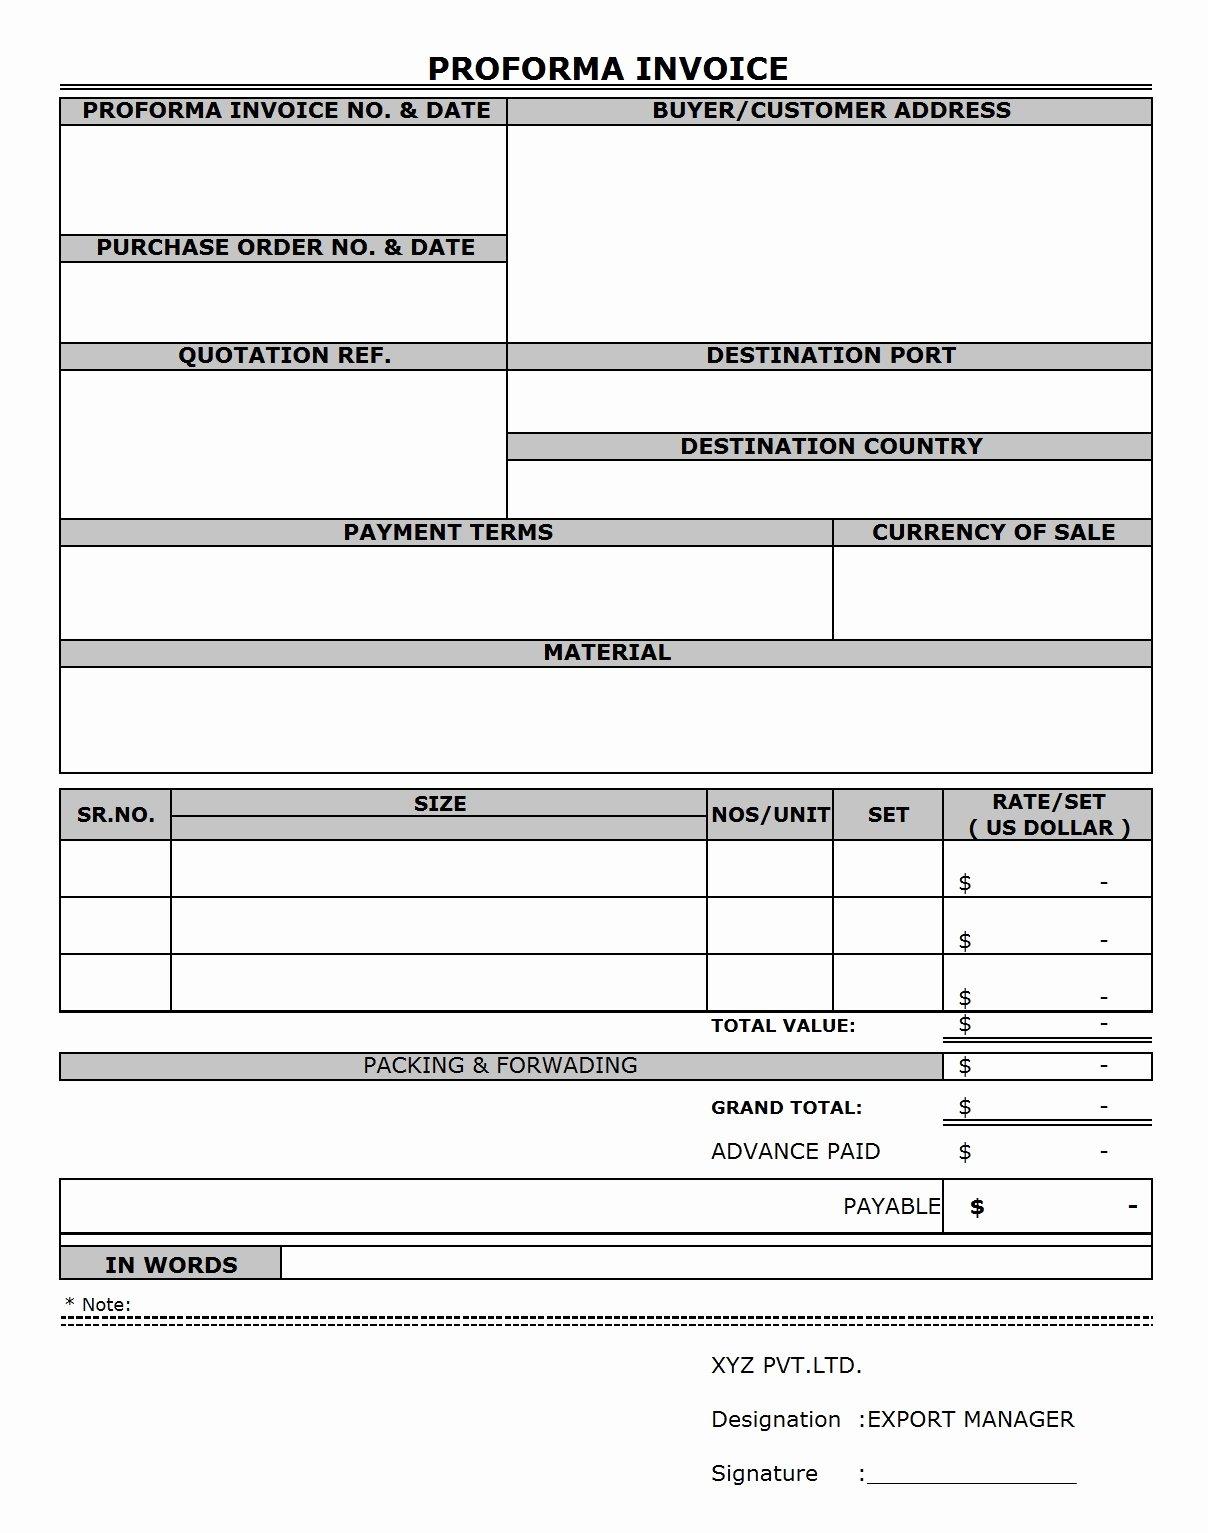 Proforma Invoice Template Excel Elegant Proforma Invoice Sample Excel Invoice Template Ideas